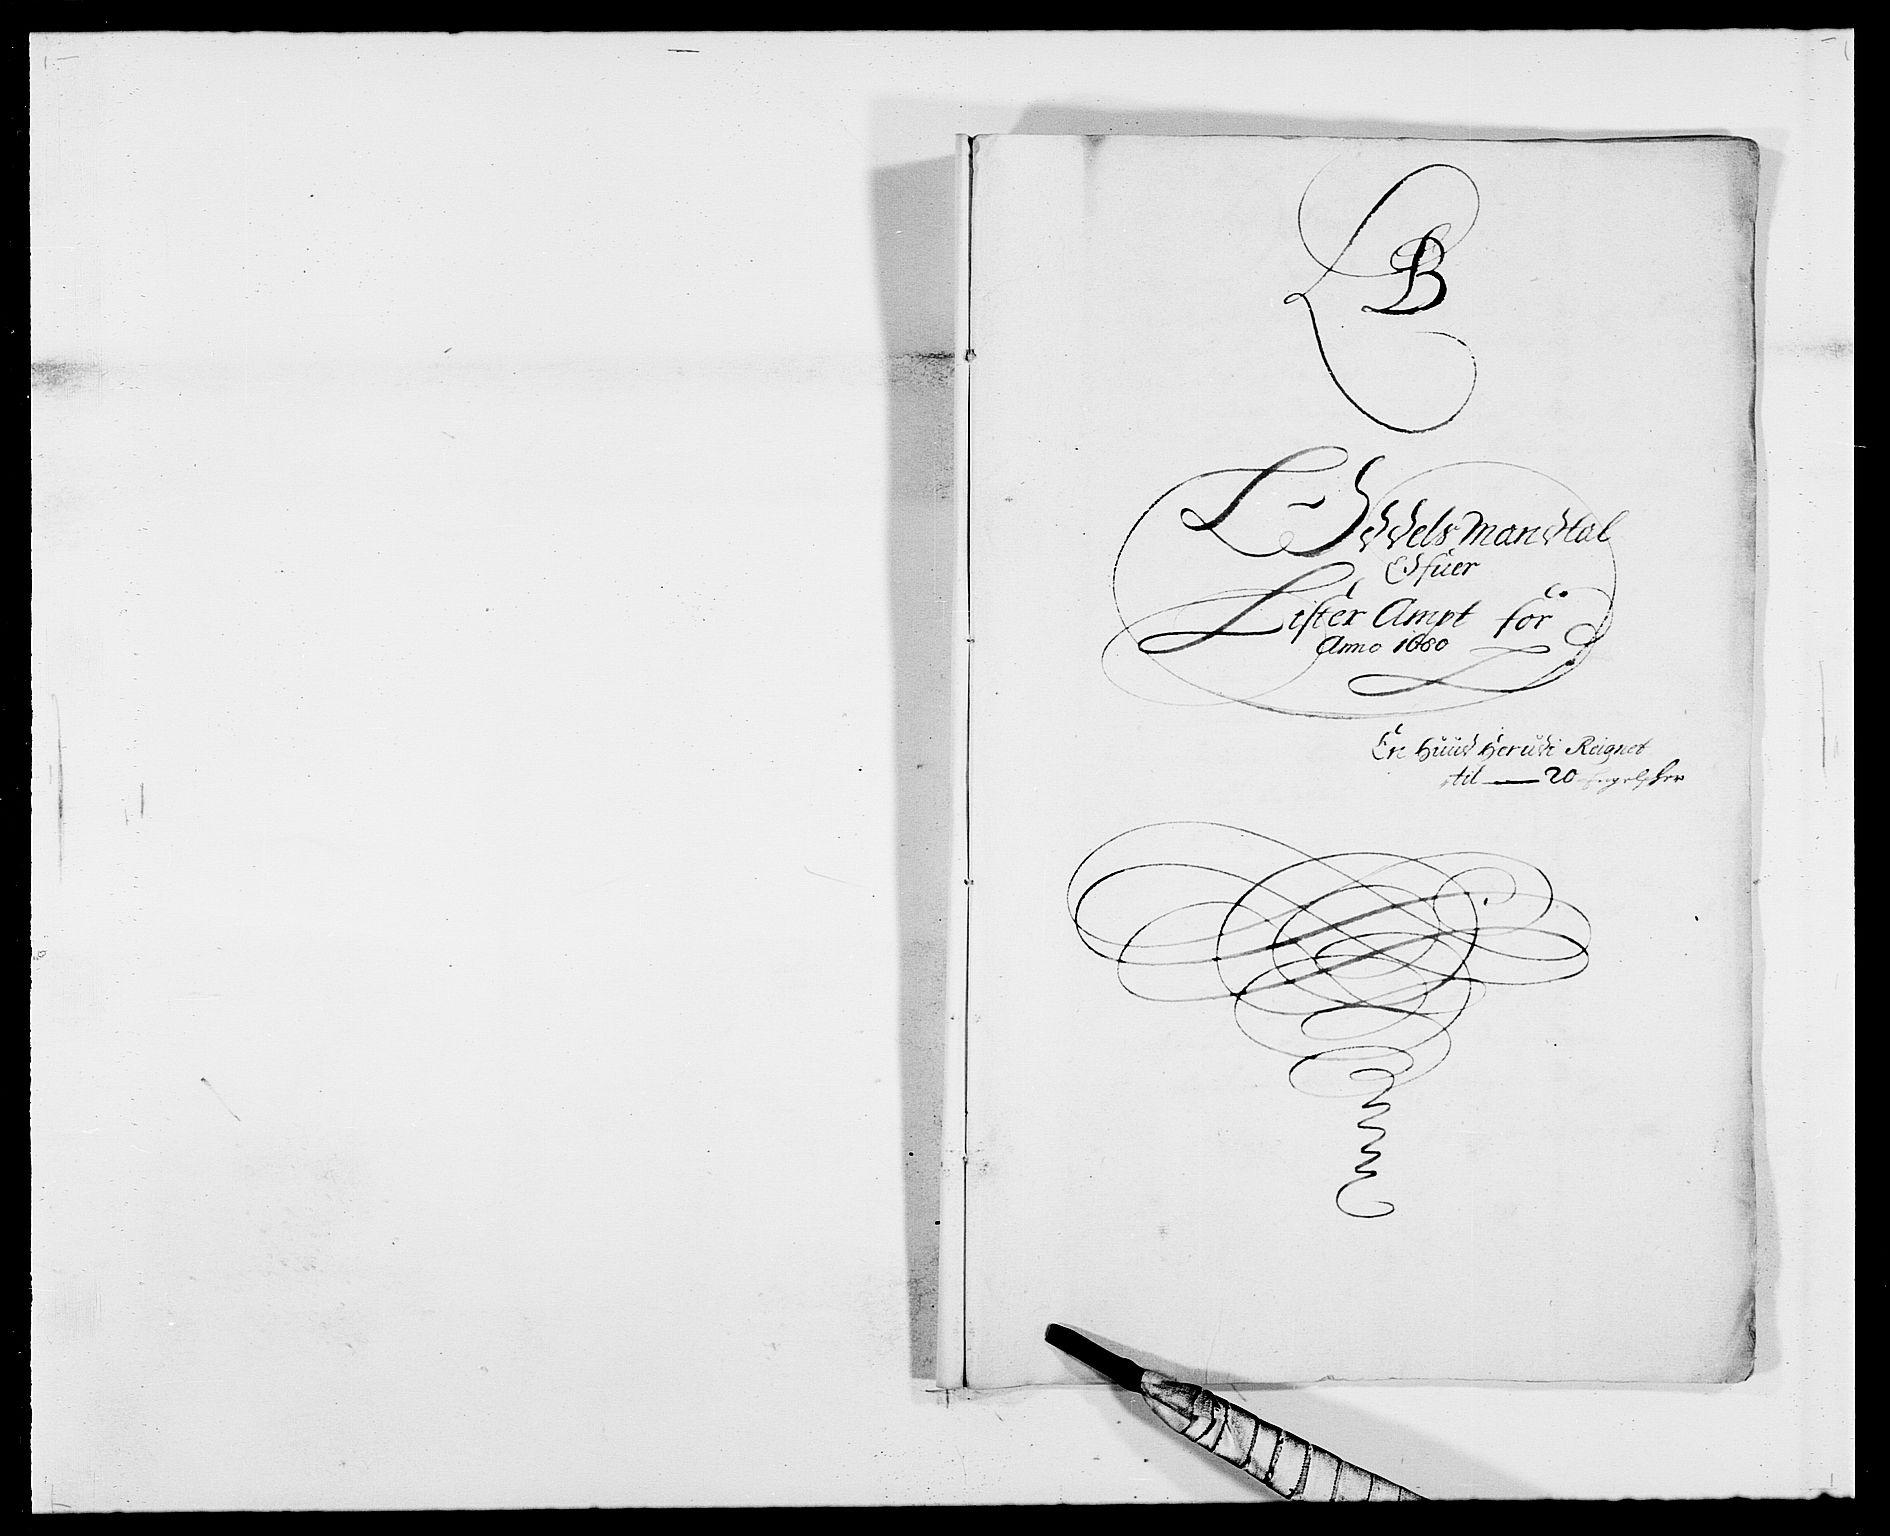 RA, Rentekammeret inntil 1814, Reviderte regnskaper, Fogderegnskap, R41/L2531: Fogderegnskap Lista, 1680-1682, s. 45